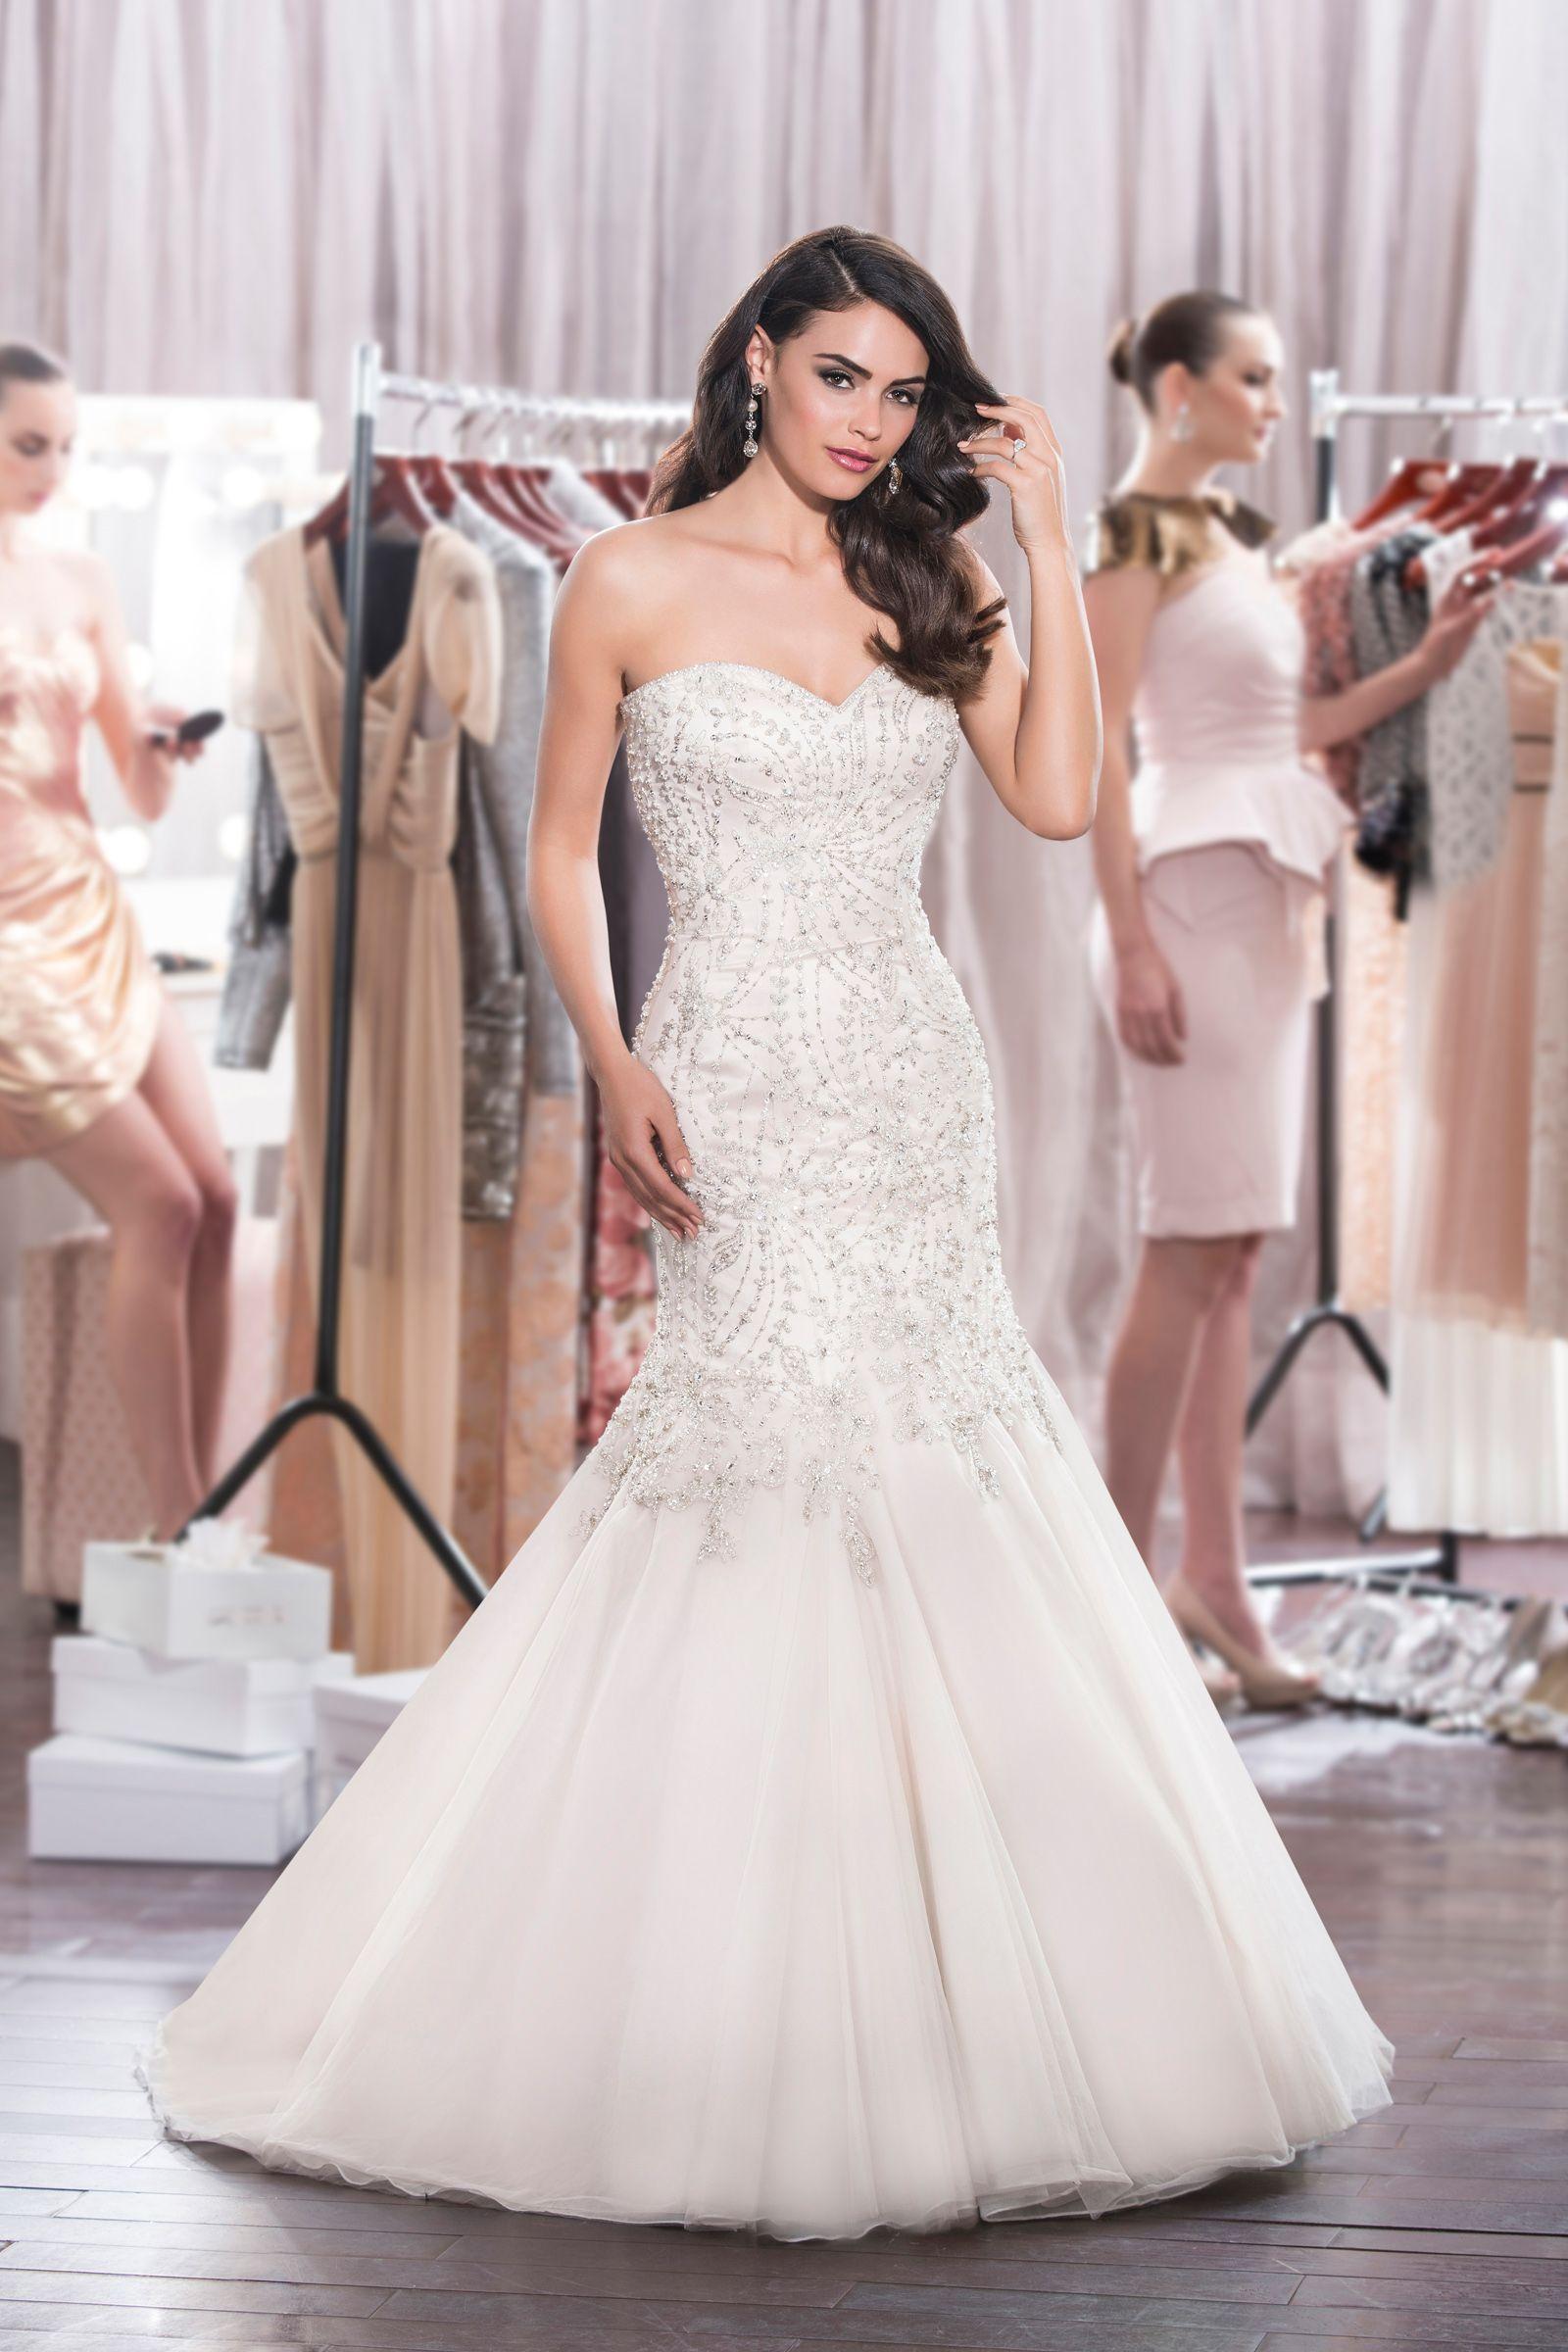 Winter wedding dresses plus size  Roz la Kelin  Zsa Zsa  Winter Wedding  Pinterest  Zsa zsa